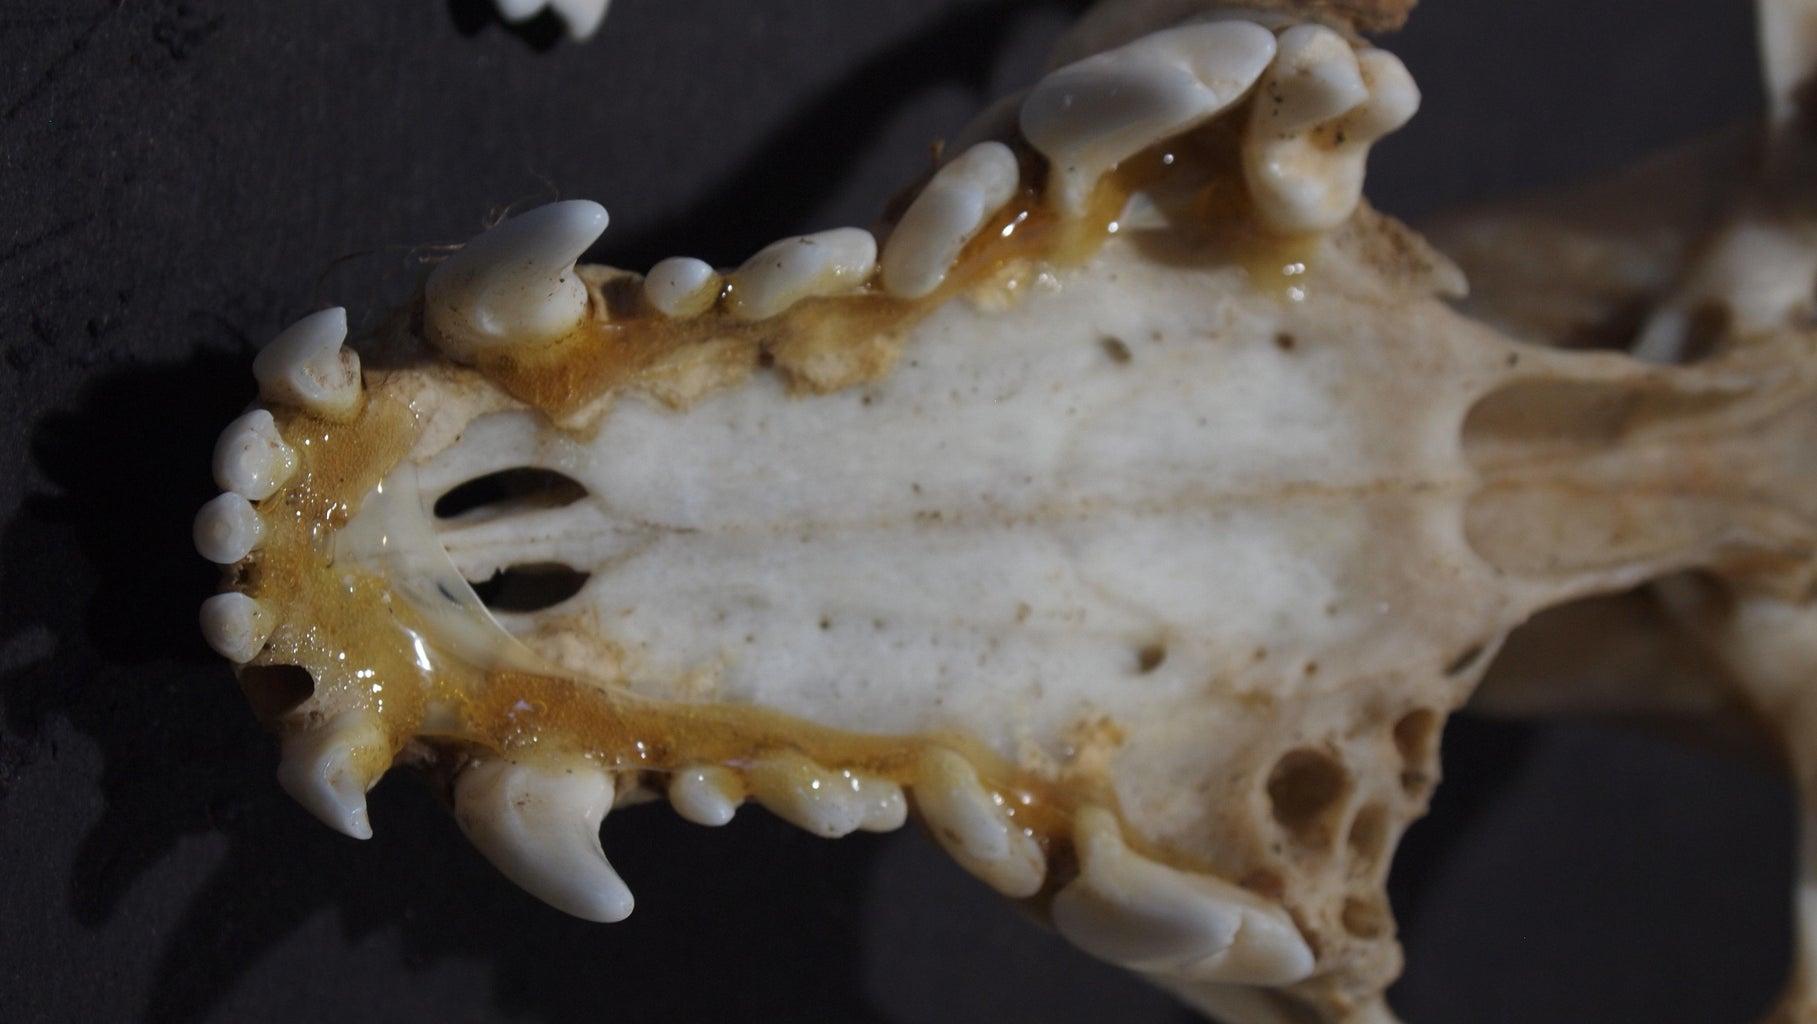 Skull, Bones and Teeth Preperation